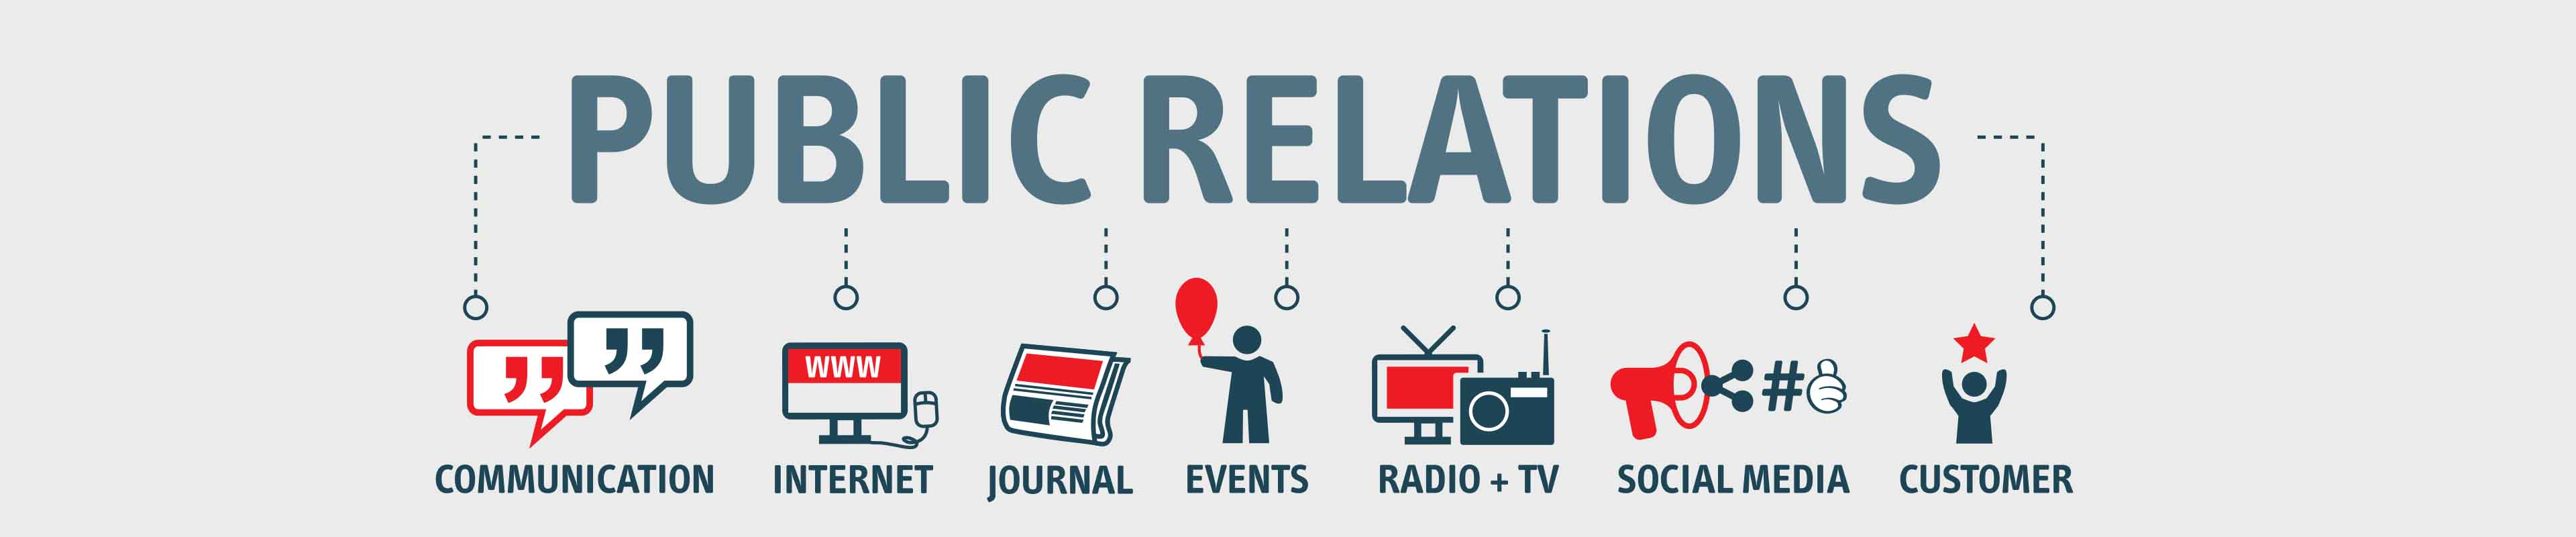 Publi Relations banner